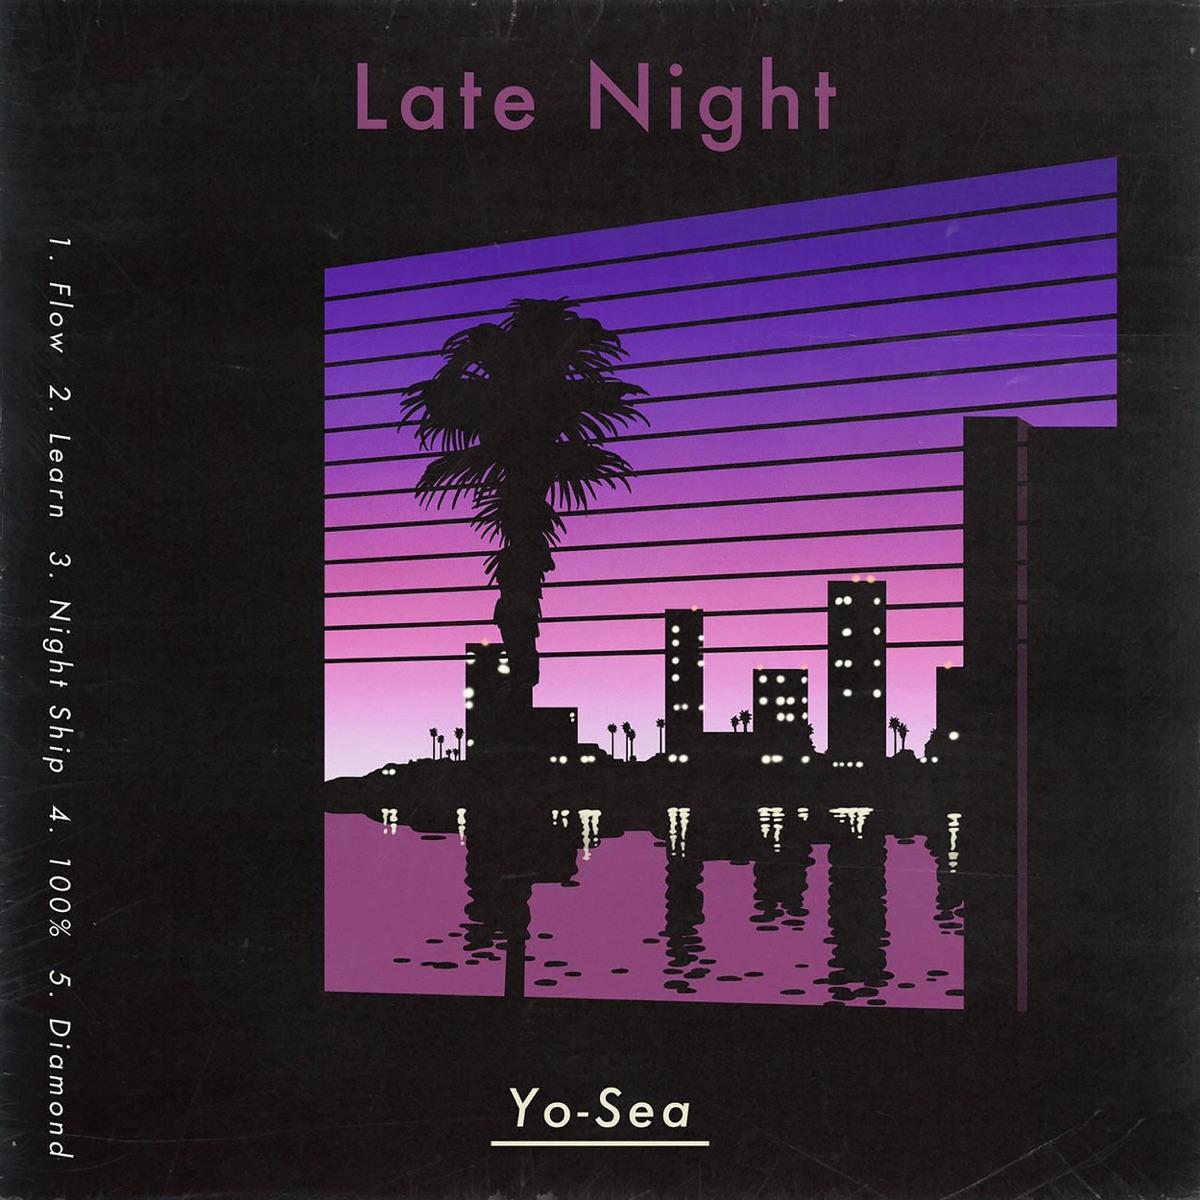 『Yo-Sea - 100% (feat. 3House)』収録の『Late Night』ジャケット